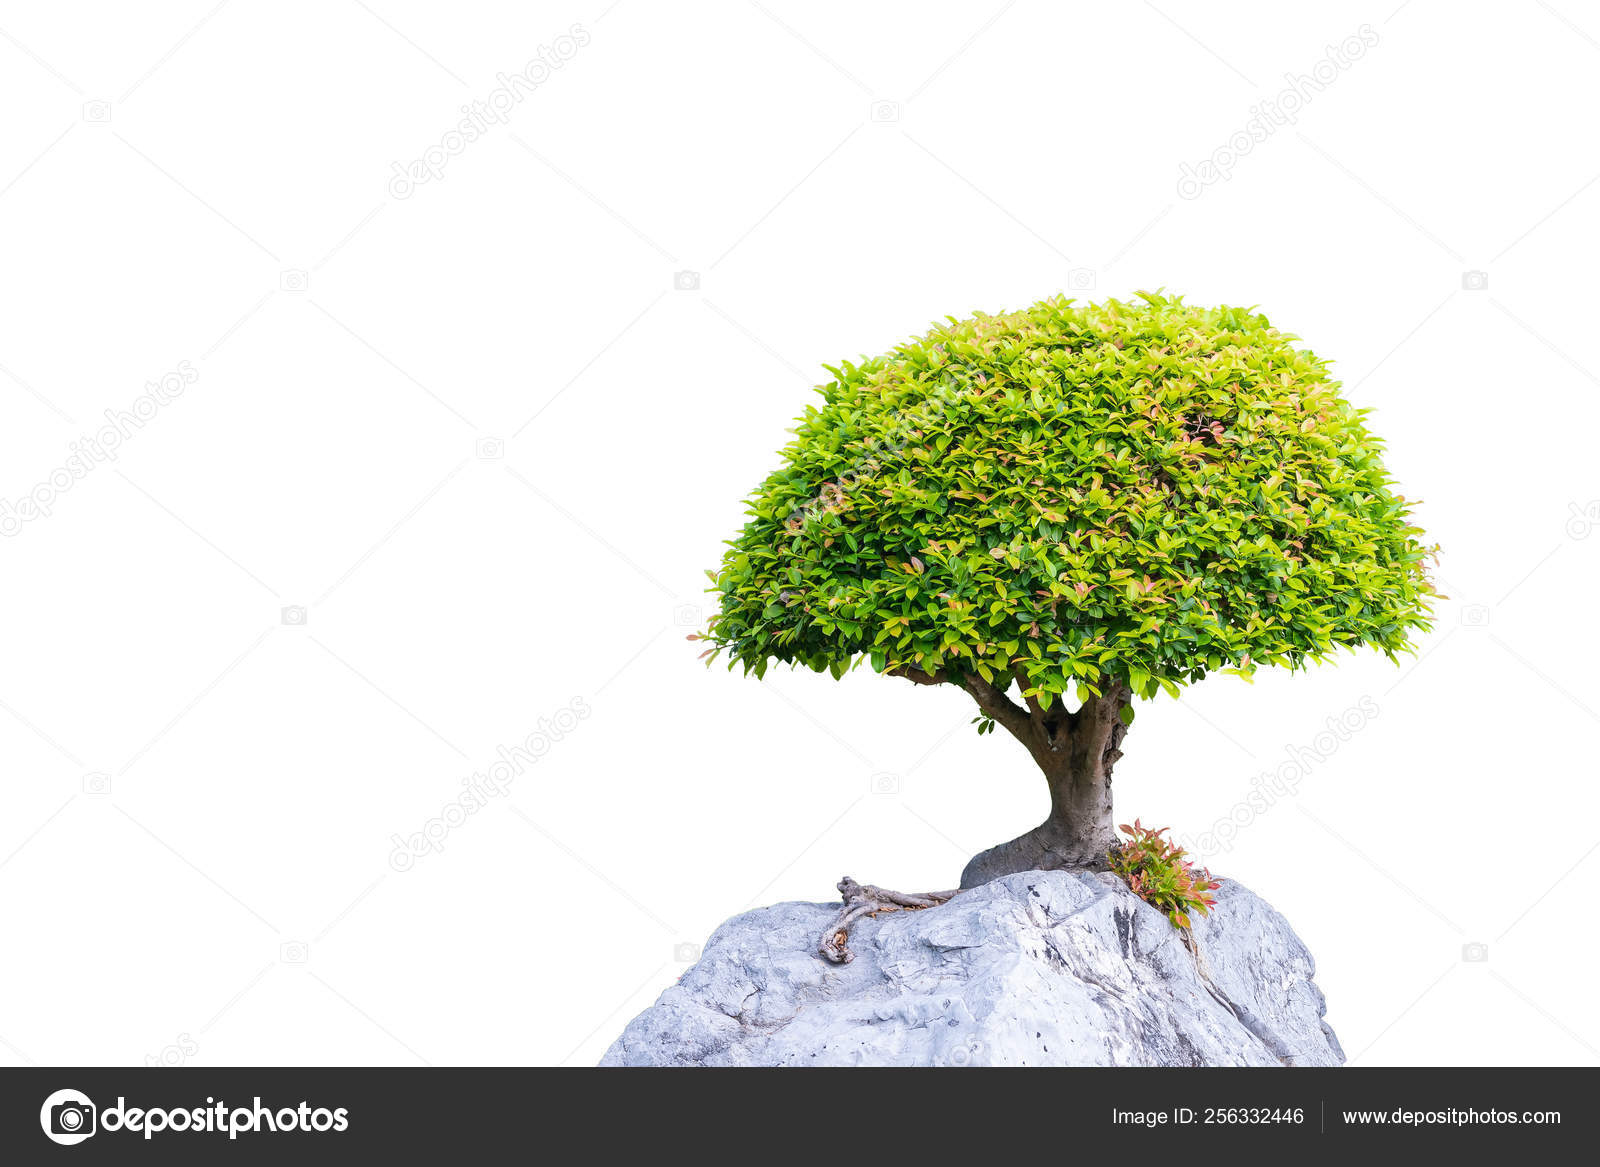 Bonsai Banyan Tree Growing On The White Rock Stock Photo By C Phichaklim1 Gmail Com 256332446